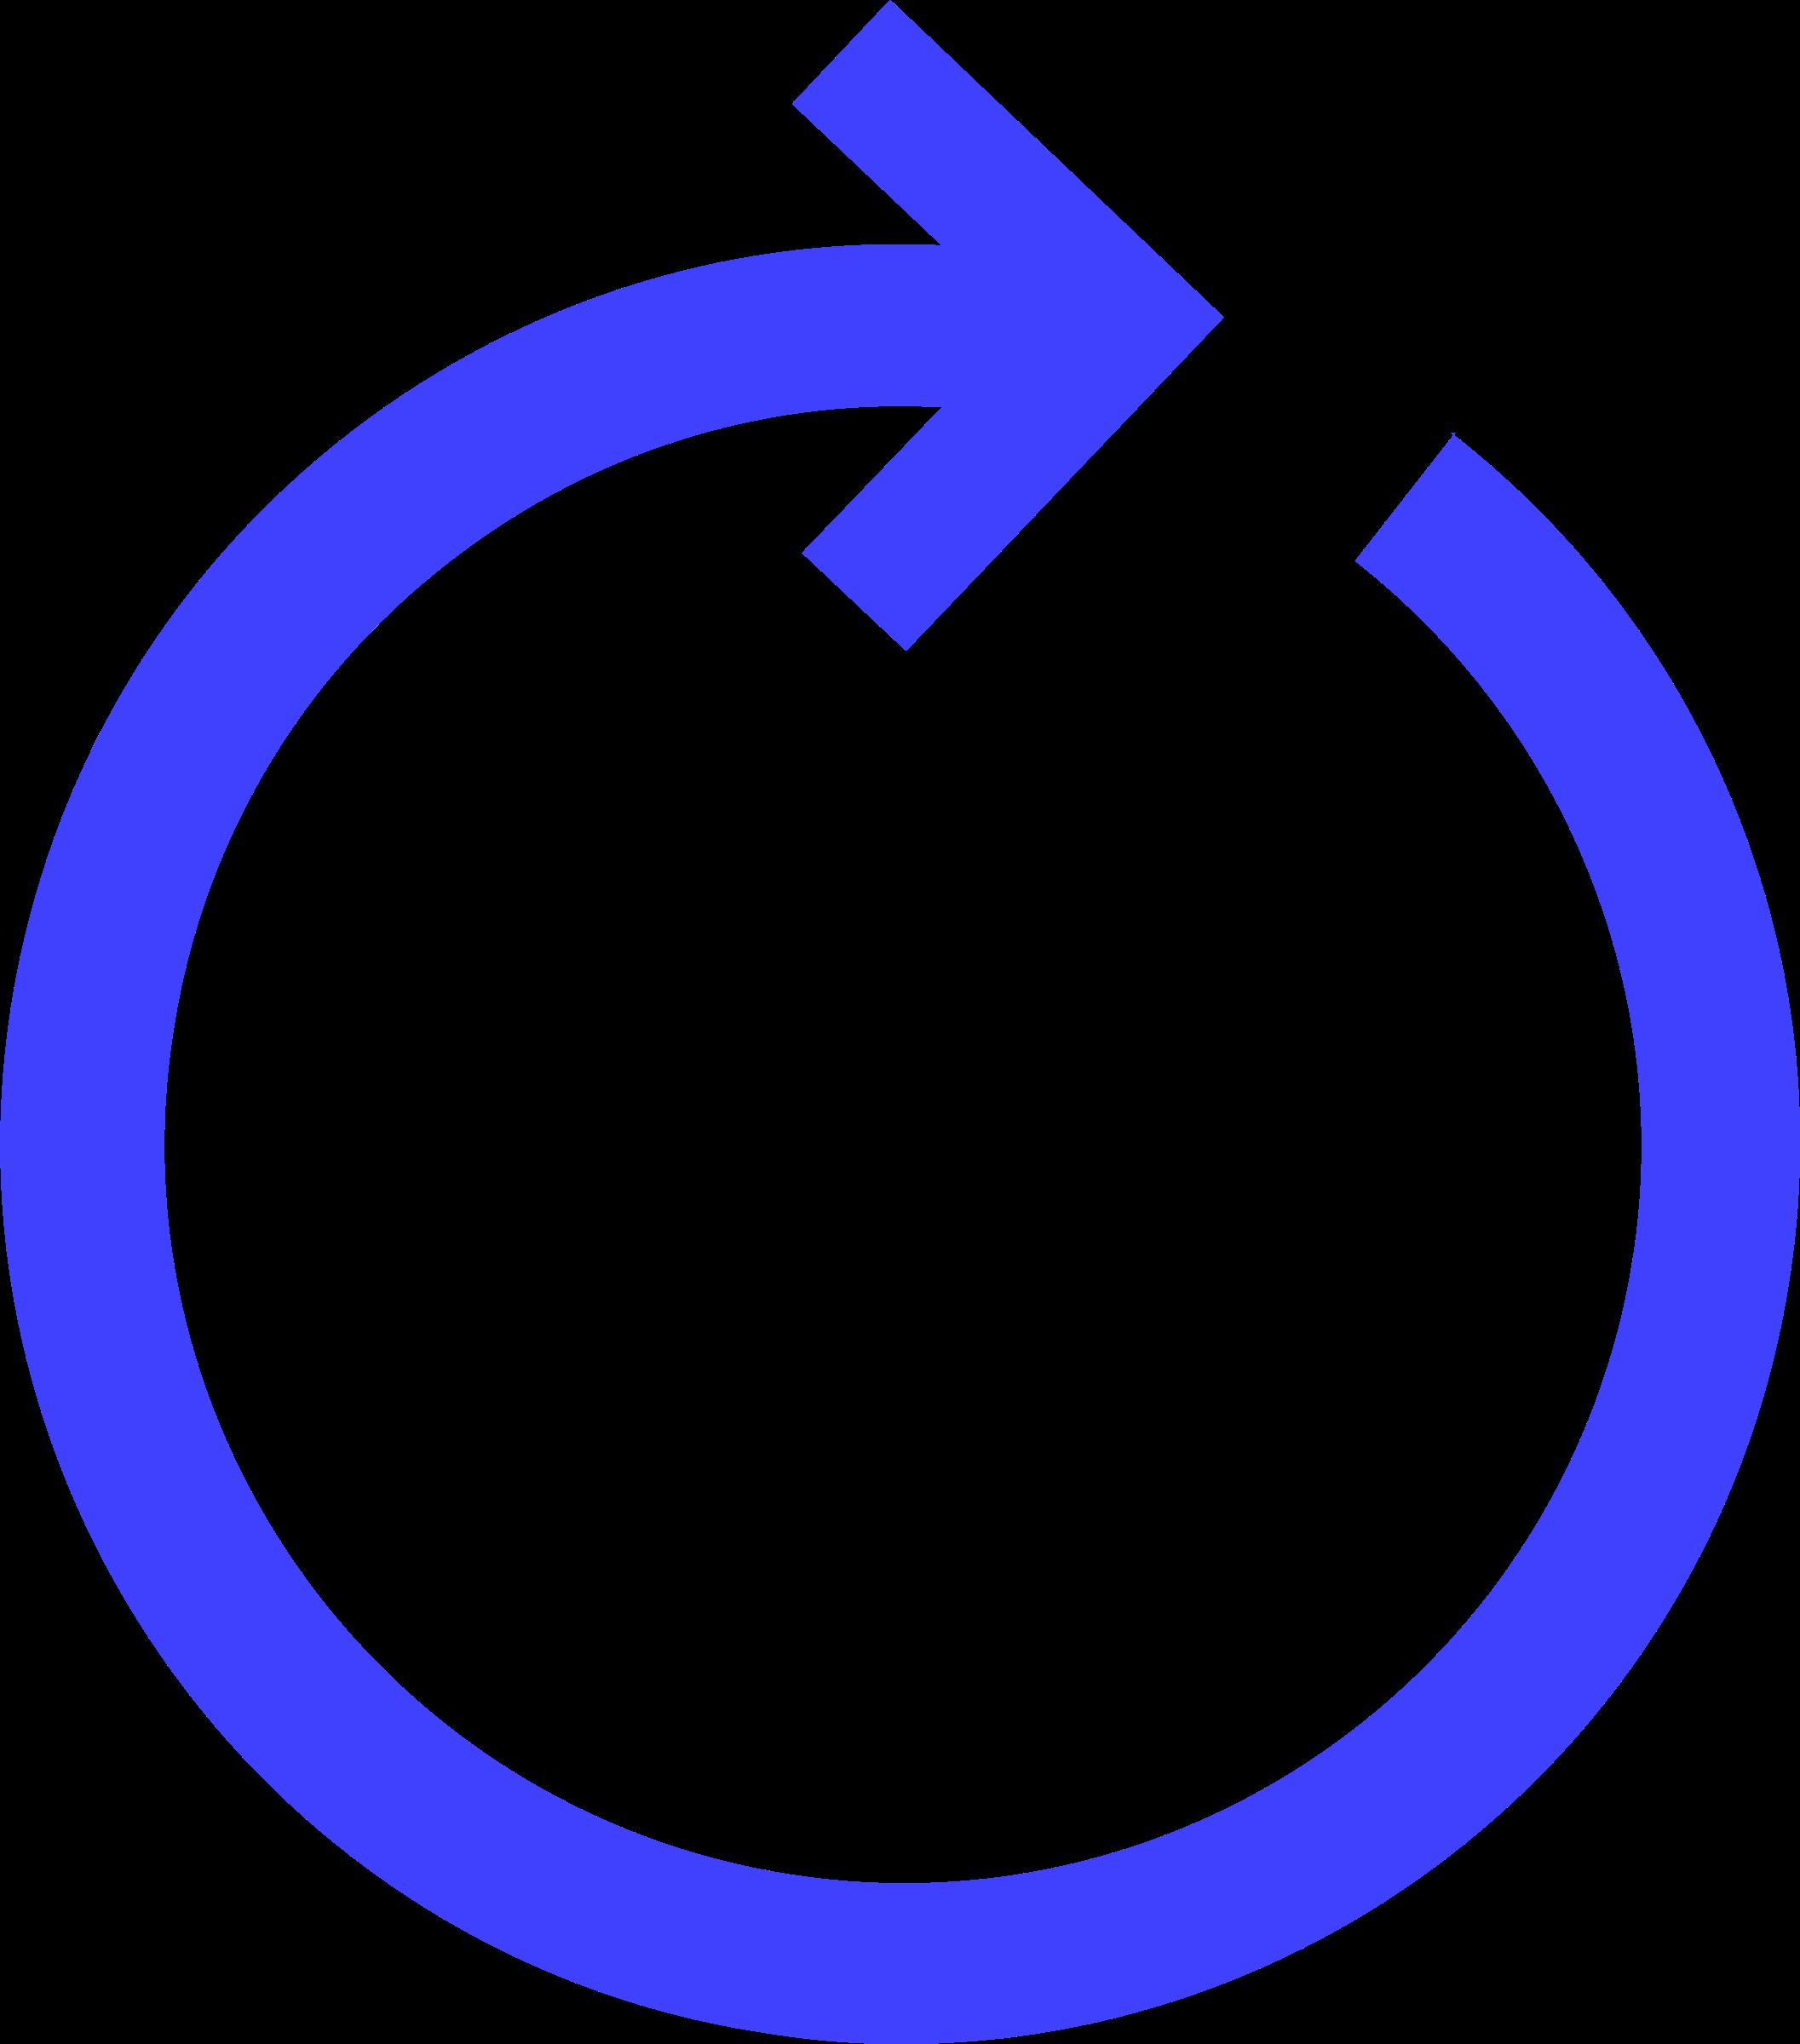 Circular blue big image. Clipart arrow circle